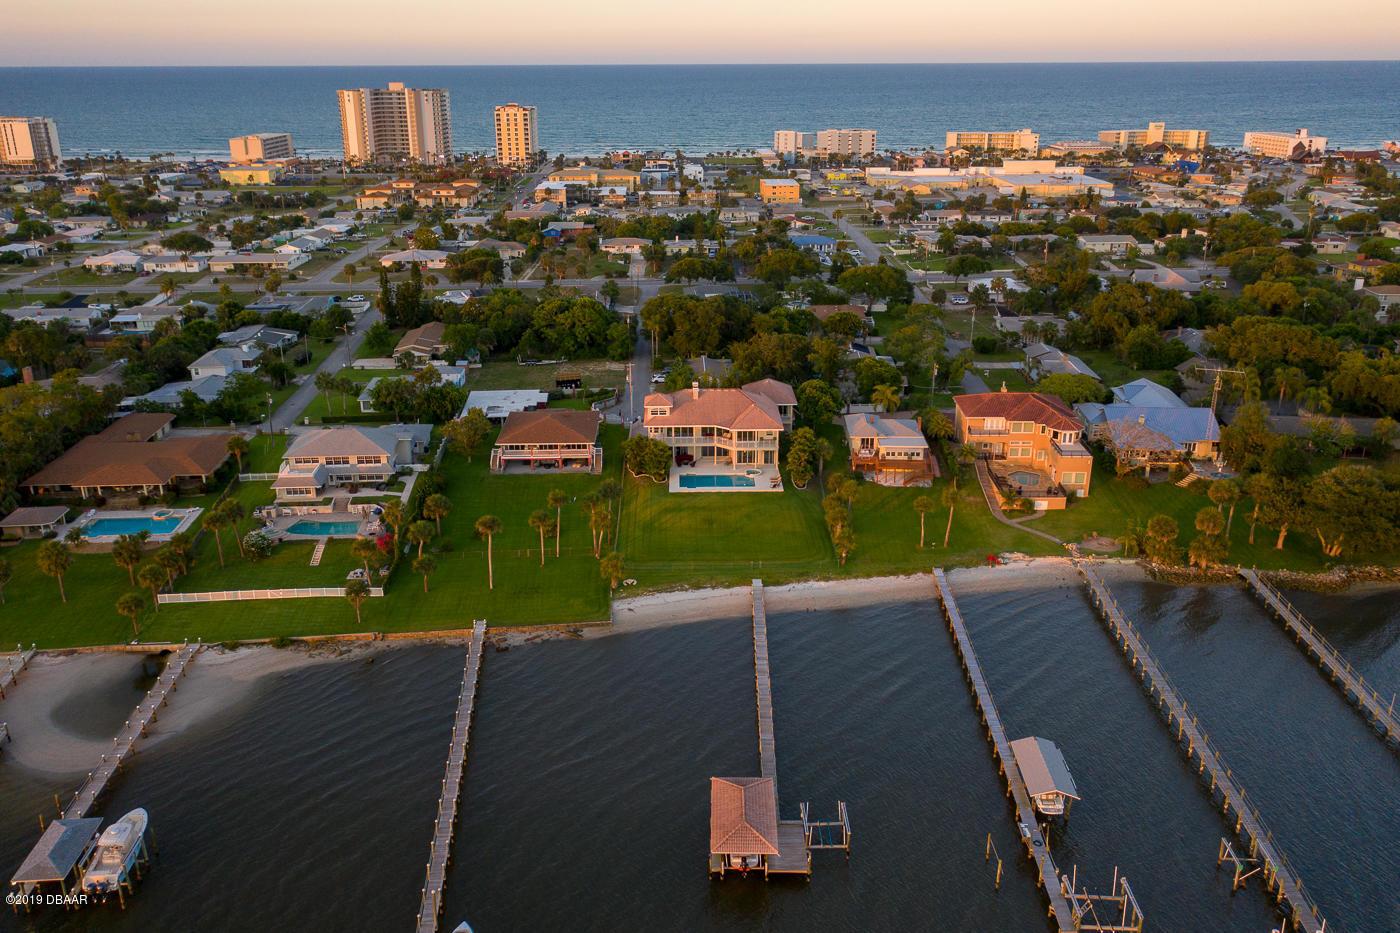 5 Widmer Daytona Beach - 101